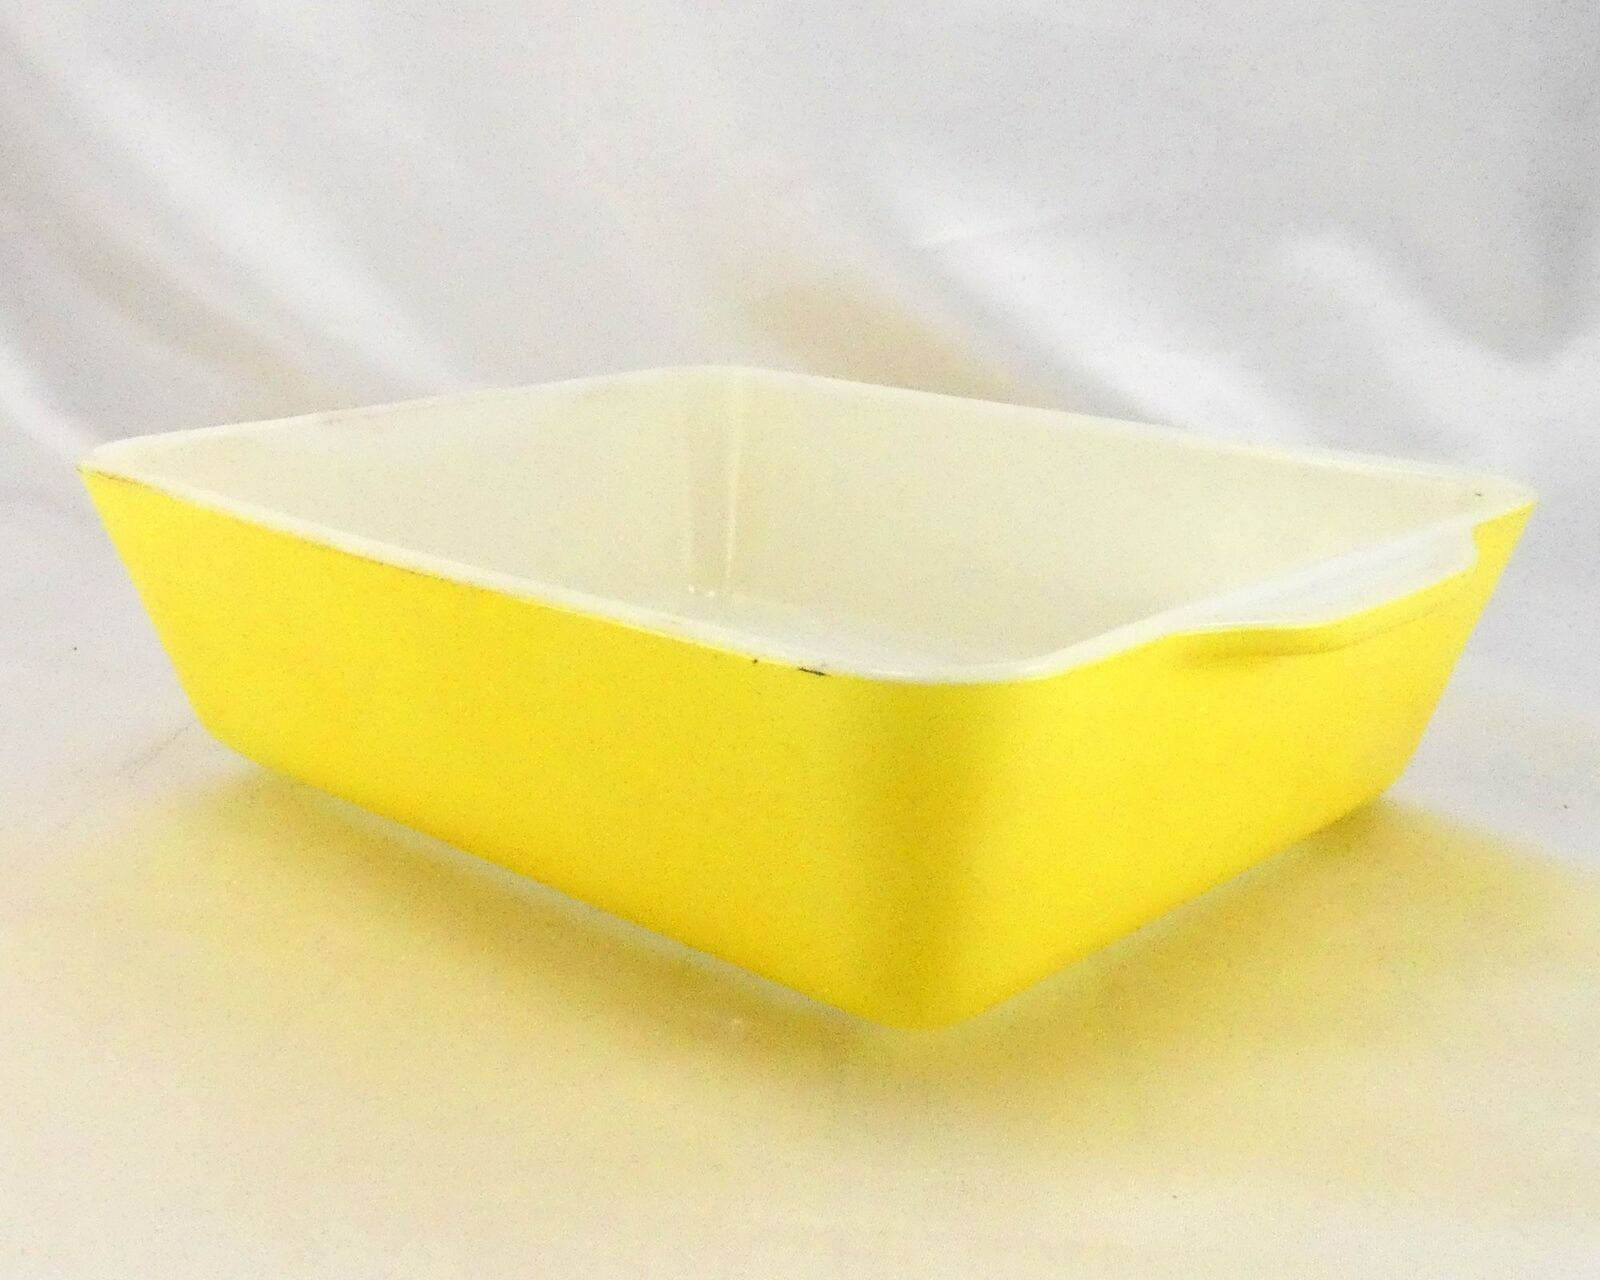 Pyrex 503 Banana Yellow Fridge Dish Milk Glass w/ Lid Made in the USA image 2